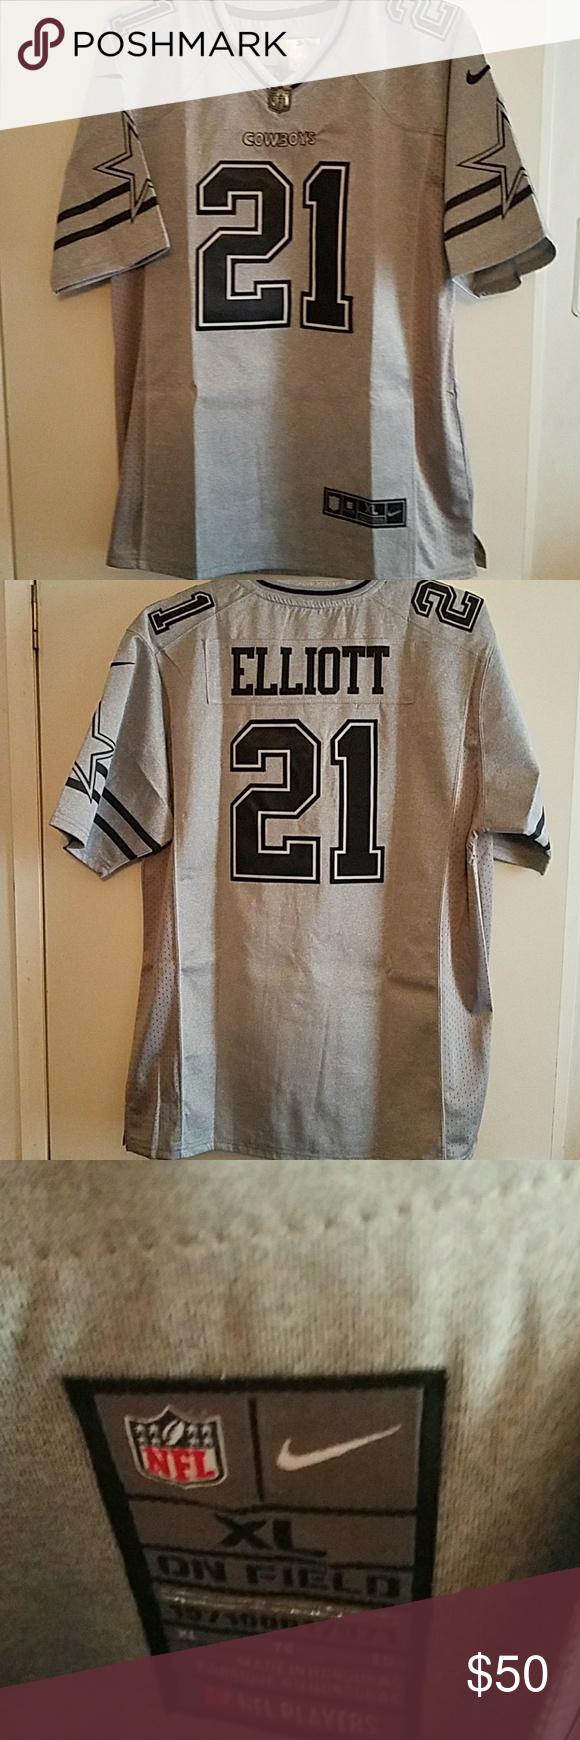 JERSEY Ezekiel Elliott grid iron jersey Other T shirts